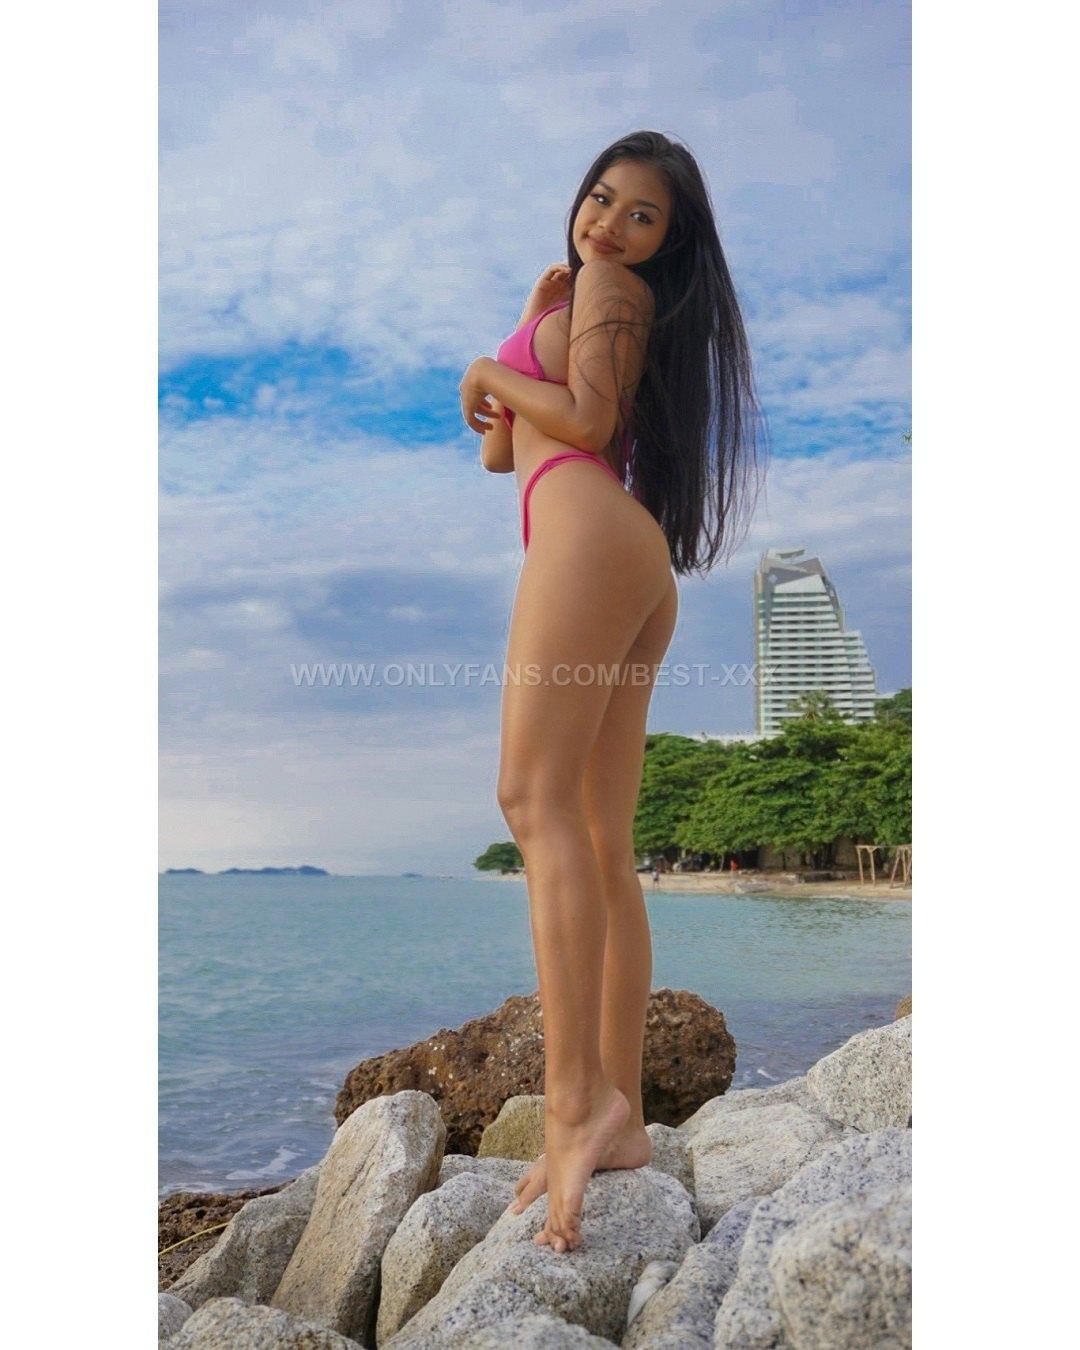 Mo Thai Pattaya Girl Leaked Onlyfans Best Xxx 0074